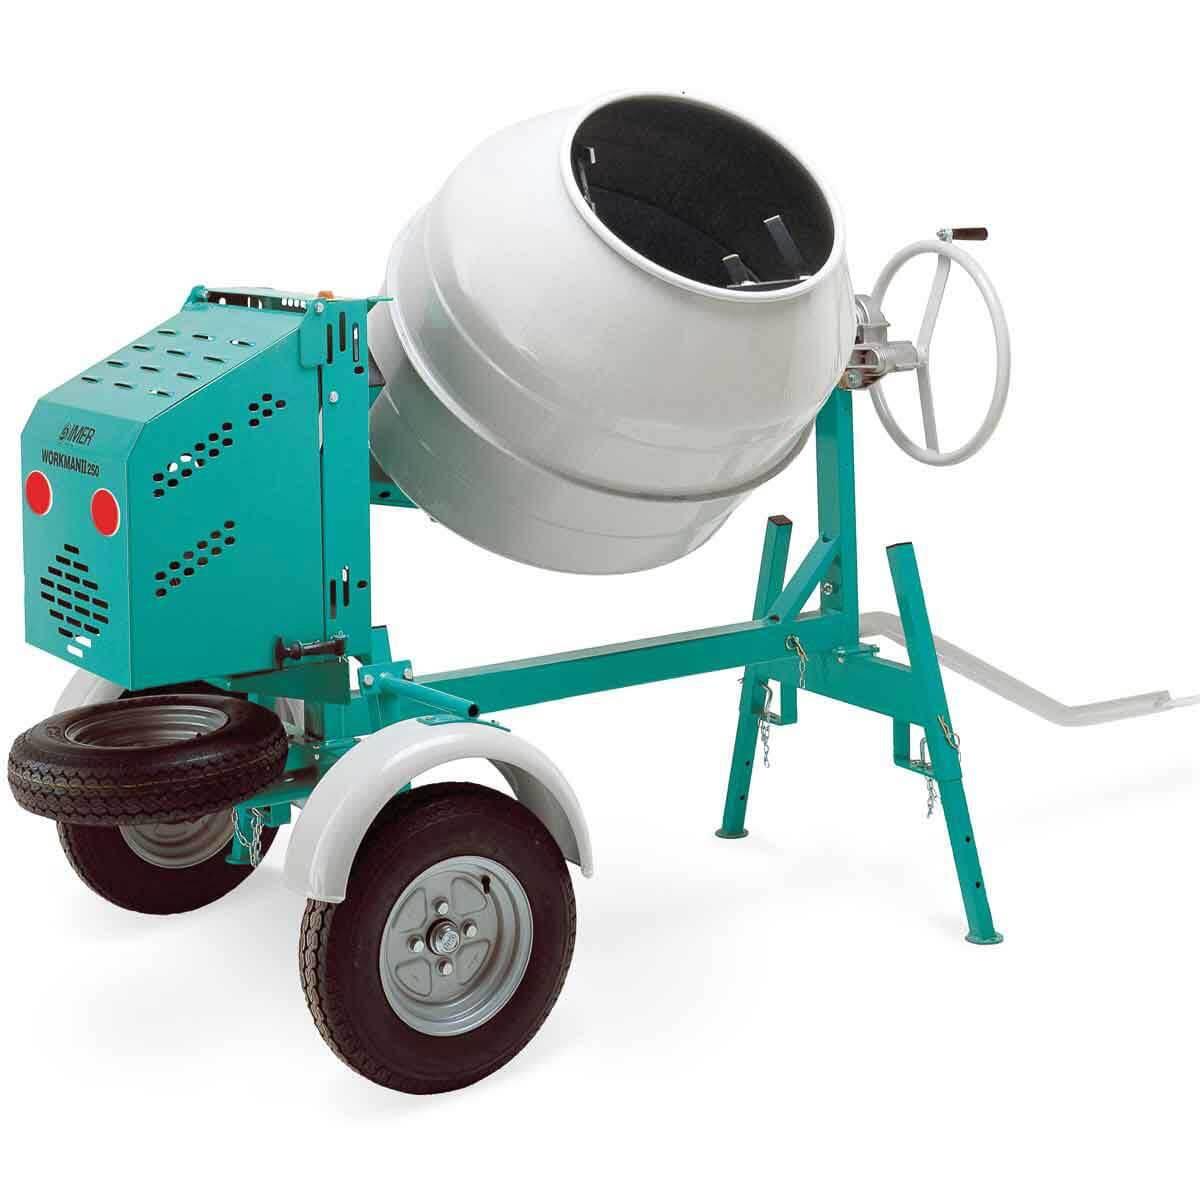 Imer Workman Concrete Mixer